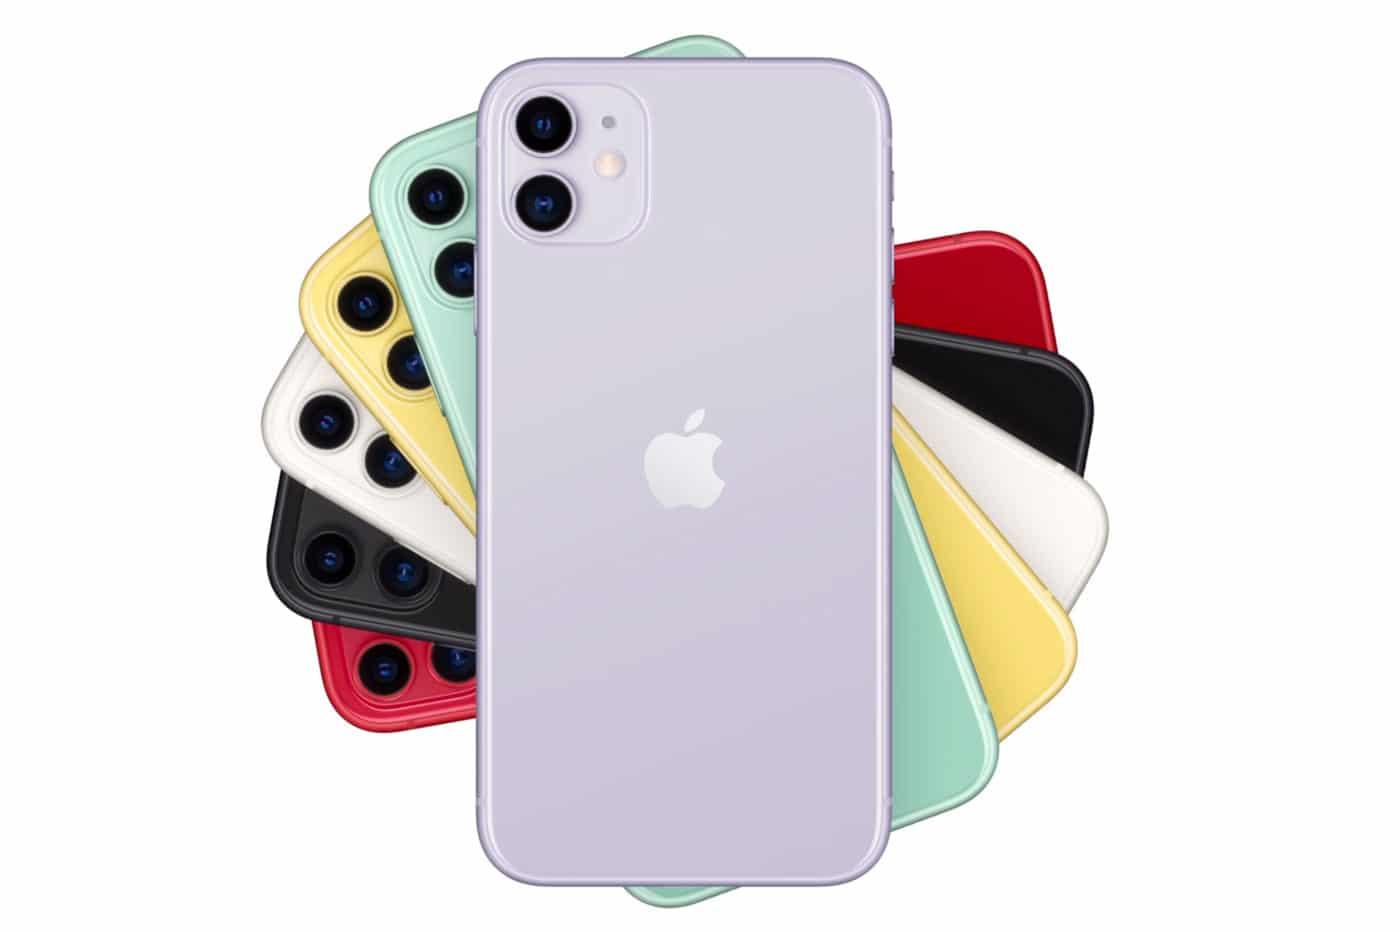 iphone 11 elma şarj cihazı